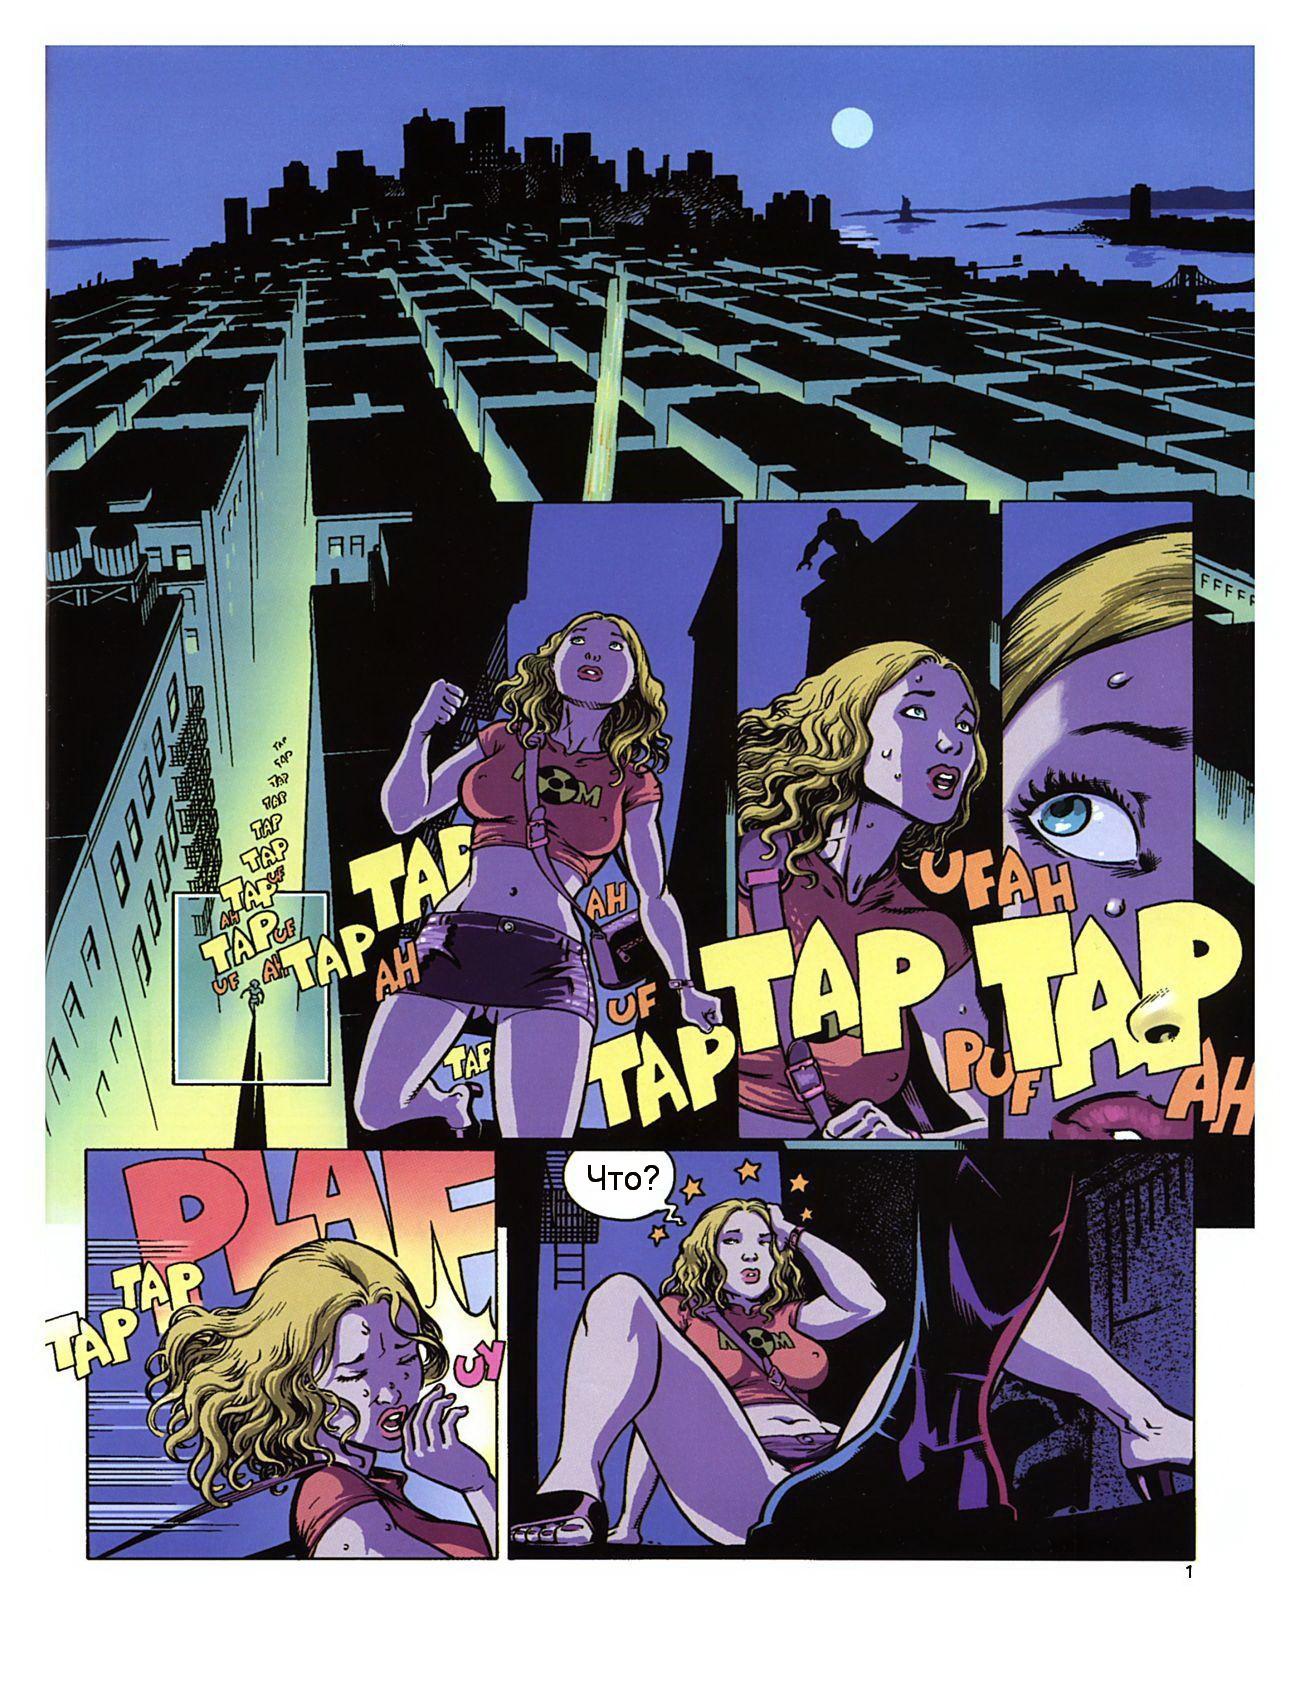 Супергерои Нью-Йорка (NY SuperHeroes) хентай порно комикс